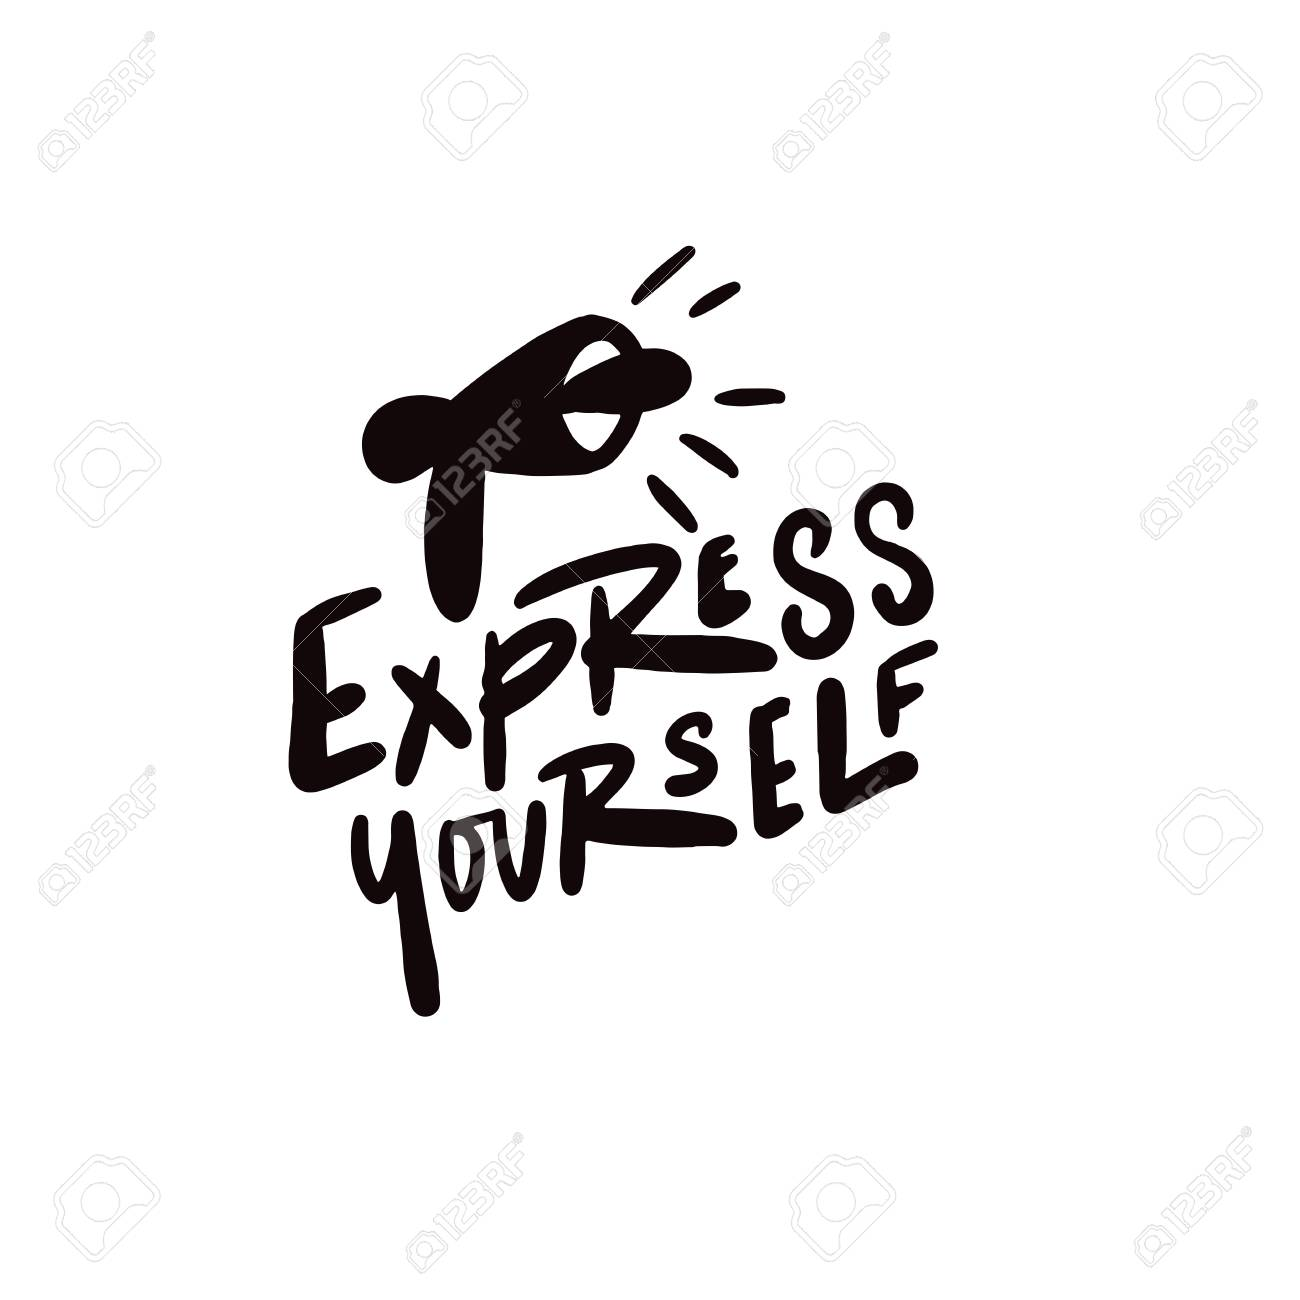 Express yourself. Hand written lettering. Vector design. Illustration of speaking trumpet. - 109881280